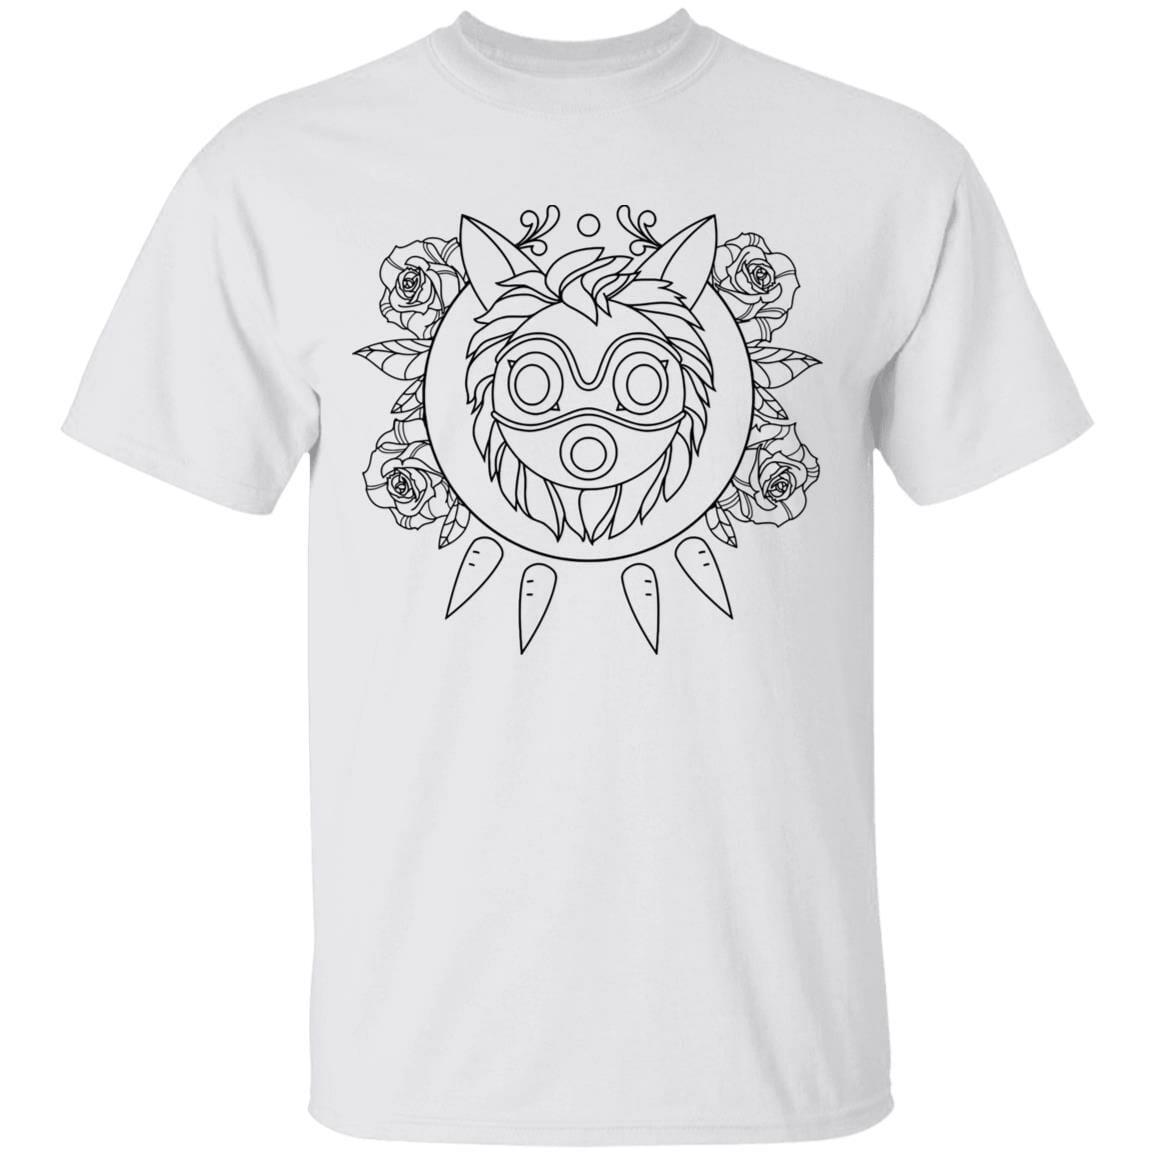 Princess Mononoke Mask in Black and White T Shirt Unisex